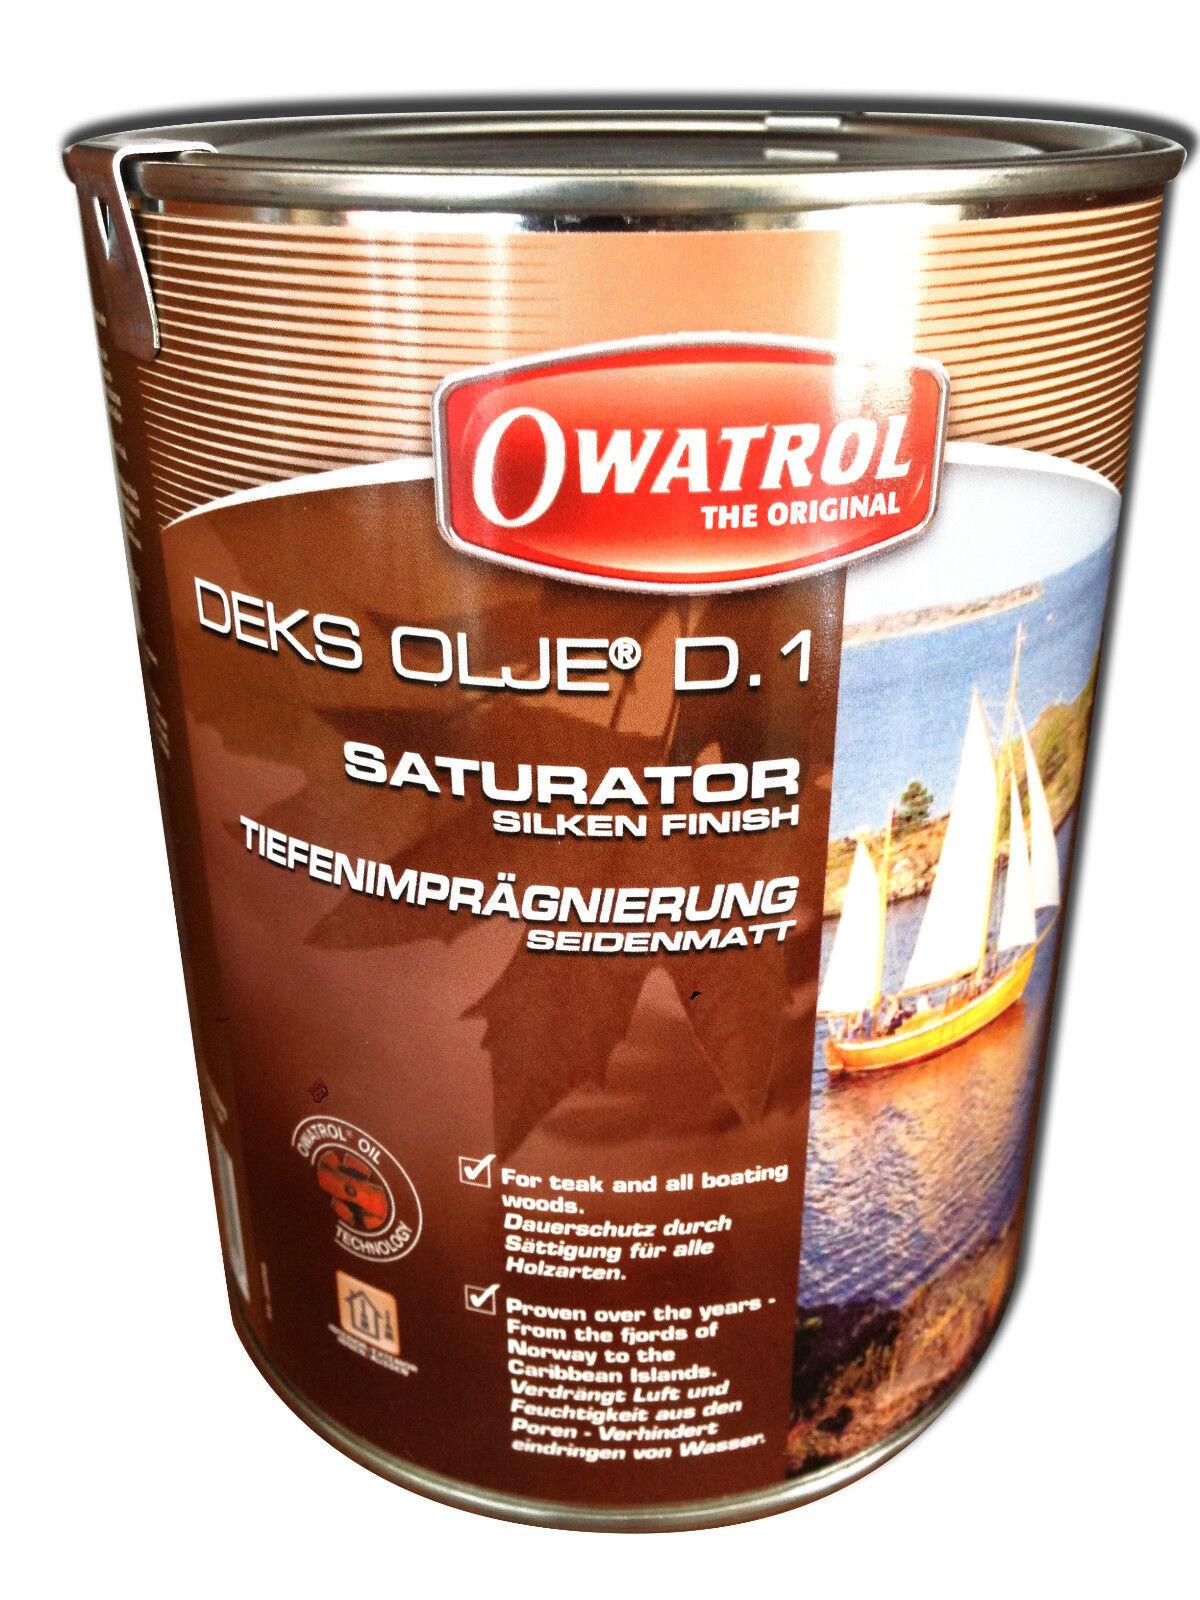 OWATROL Marine D1 DEKS OLJE Stiefelöl Holzöl Imprägnierung TEAK und andere Hölzer